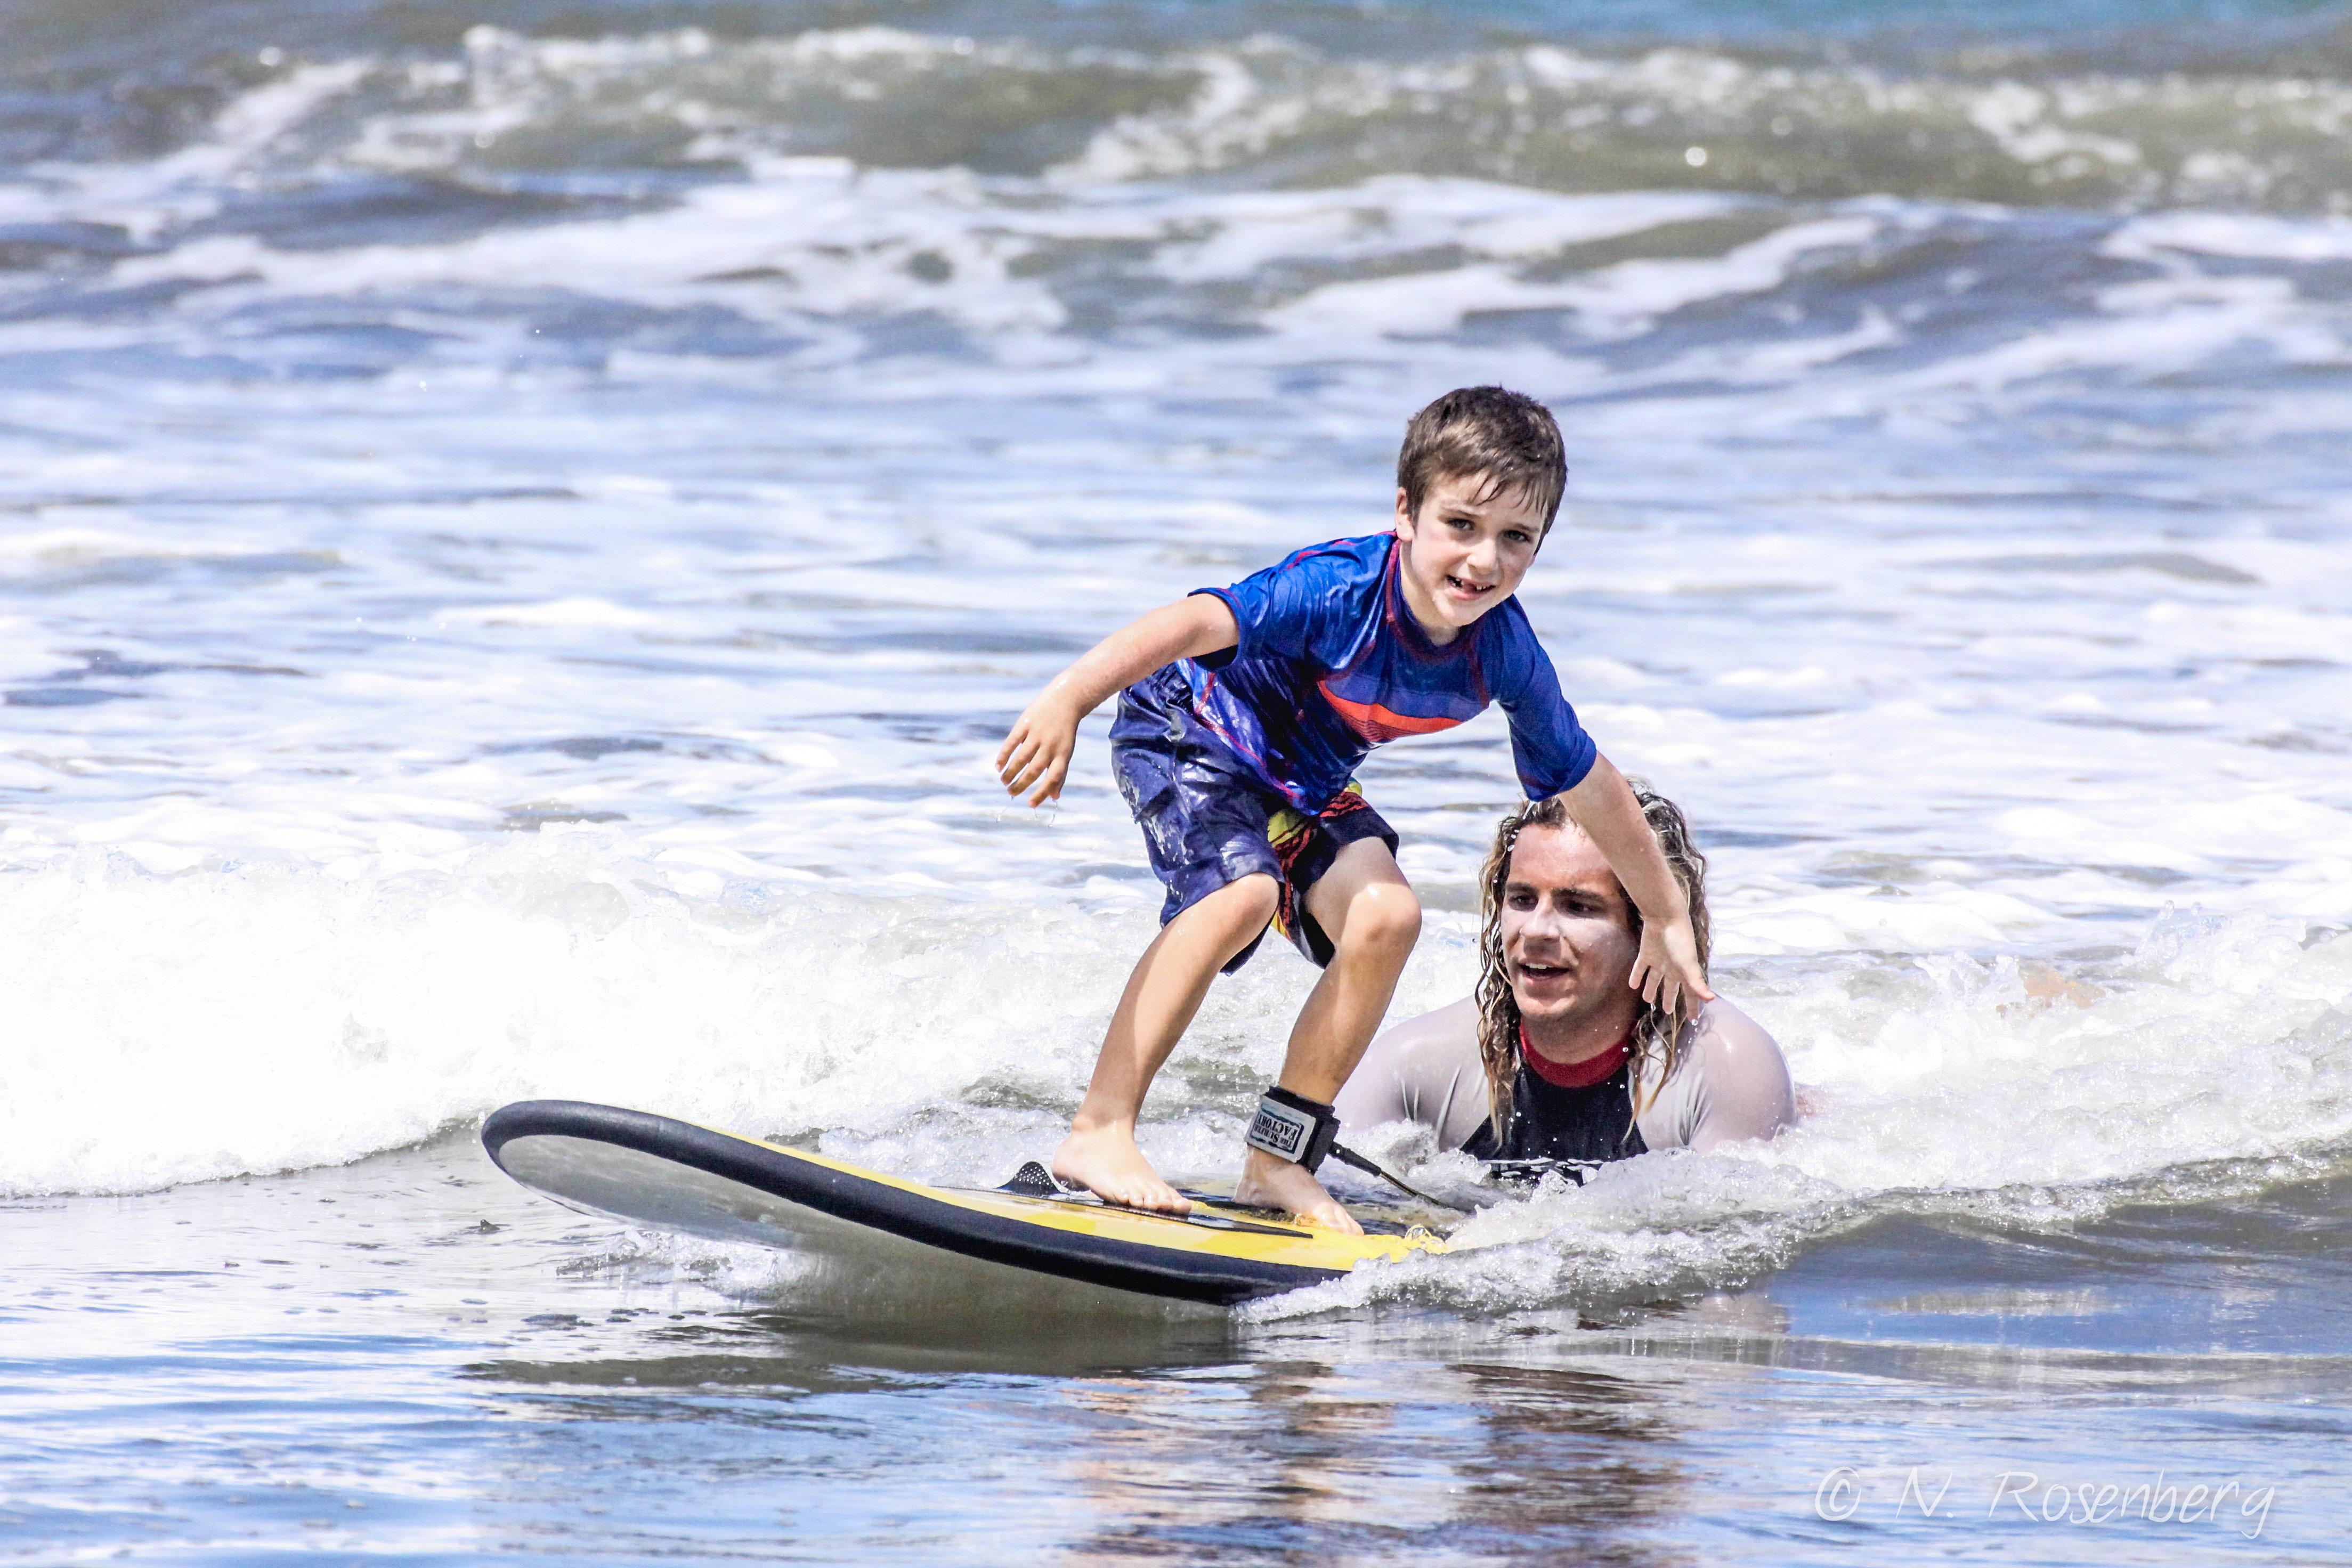 Surfschool Playa Jaco, Costa Rica